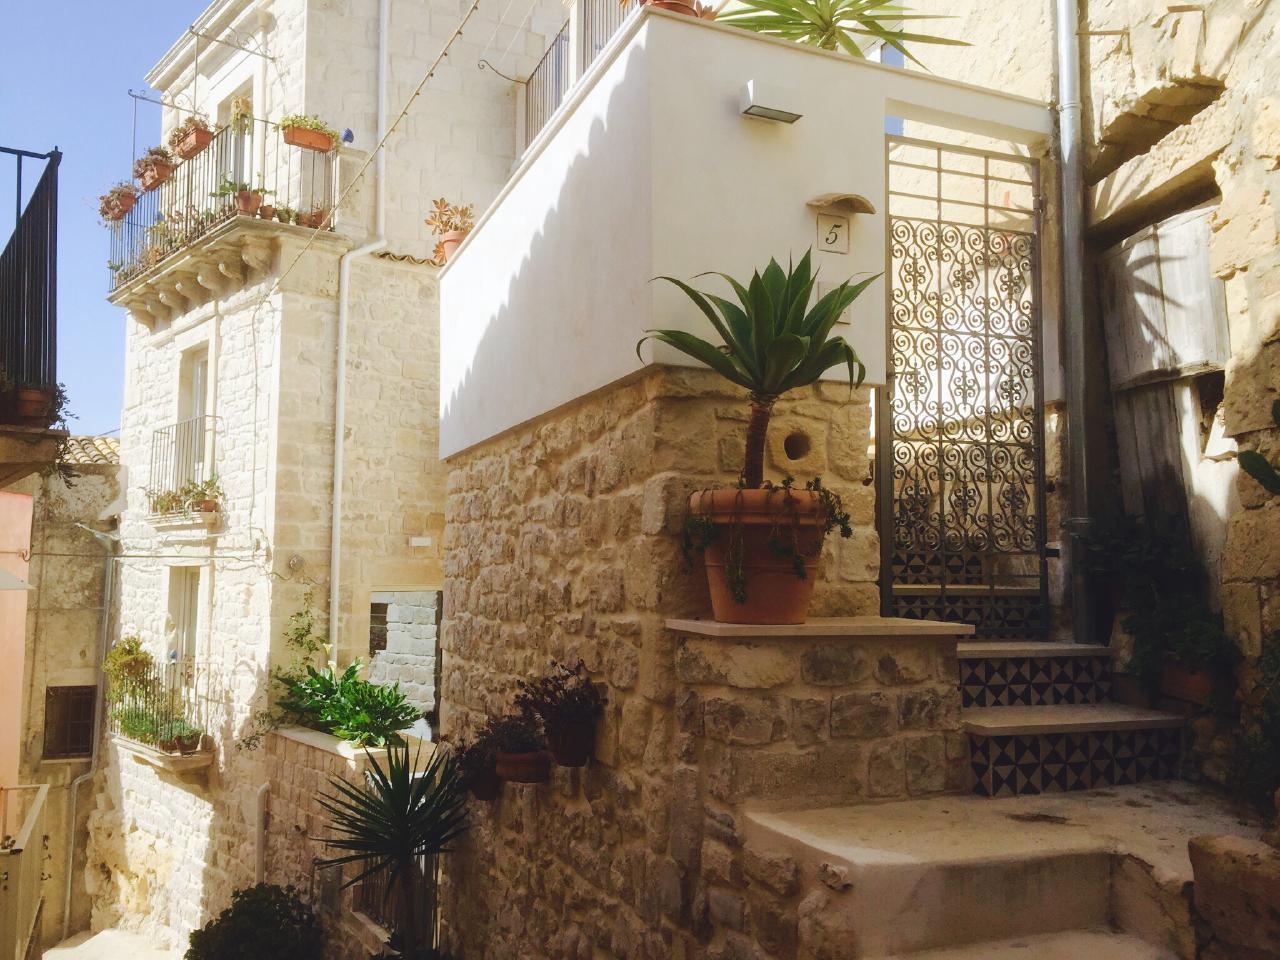 Maison de vacances Terrazza Barocca (1648450), Modica, Ragusa, Sicile, Italie, image 4